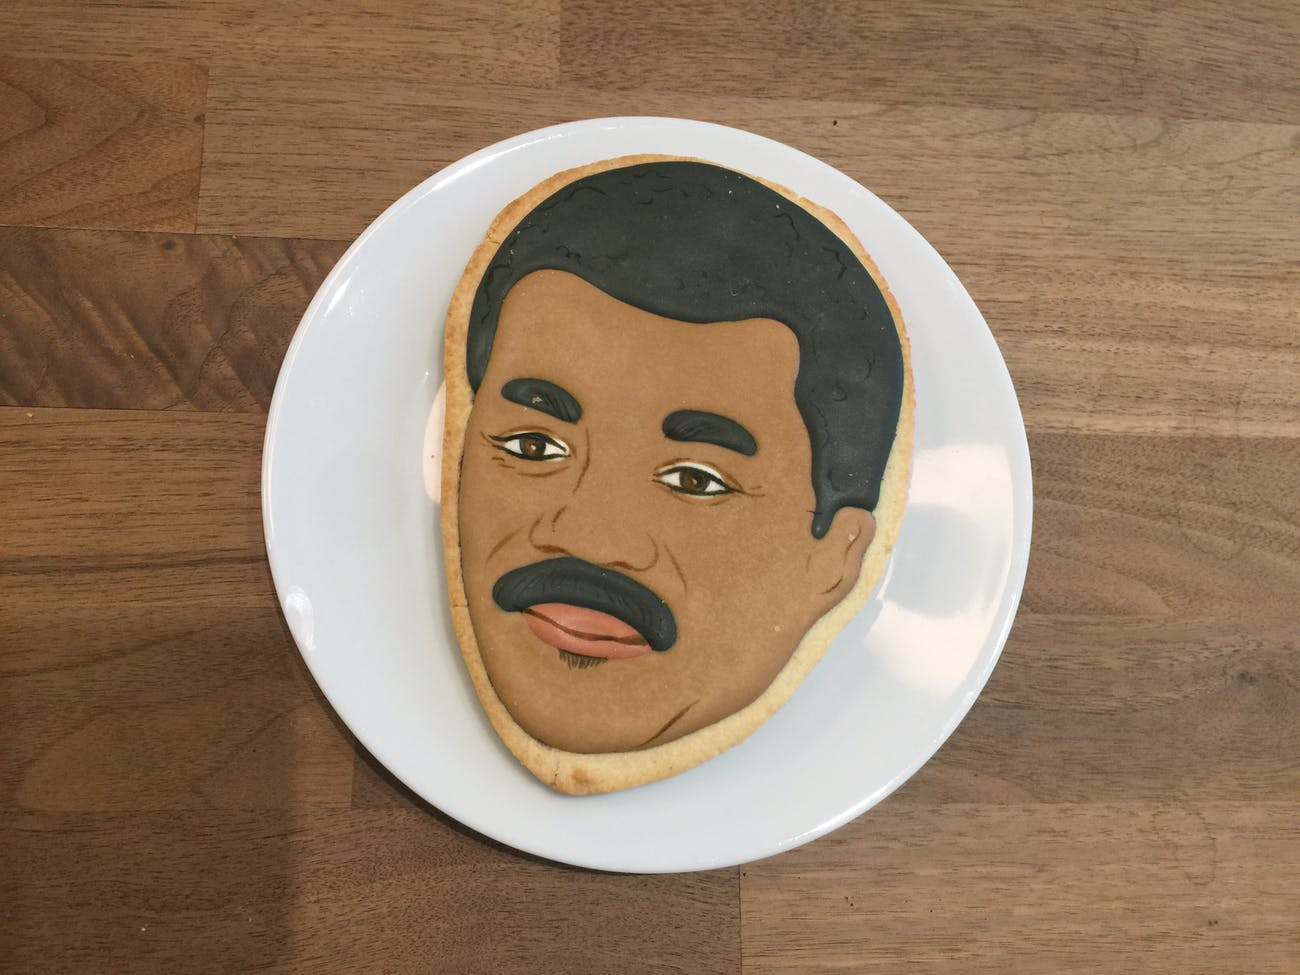 Neil deGrasse Tyson's head, as a cookie.